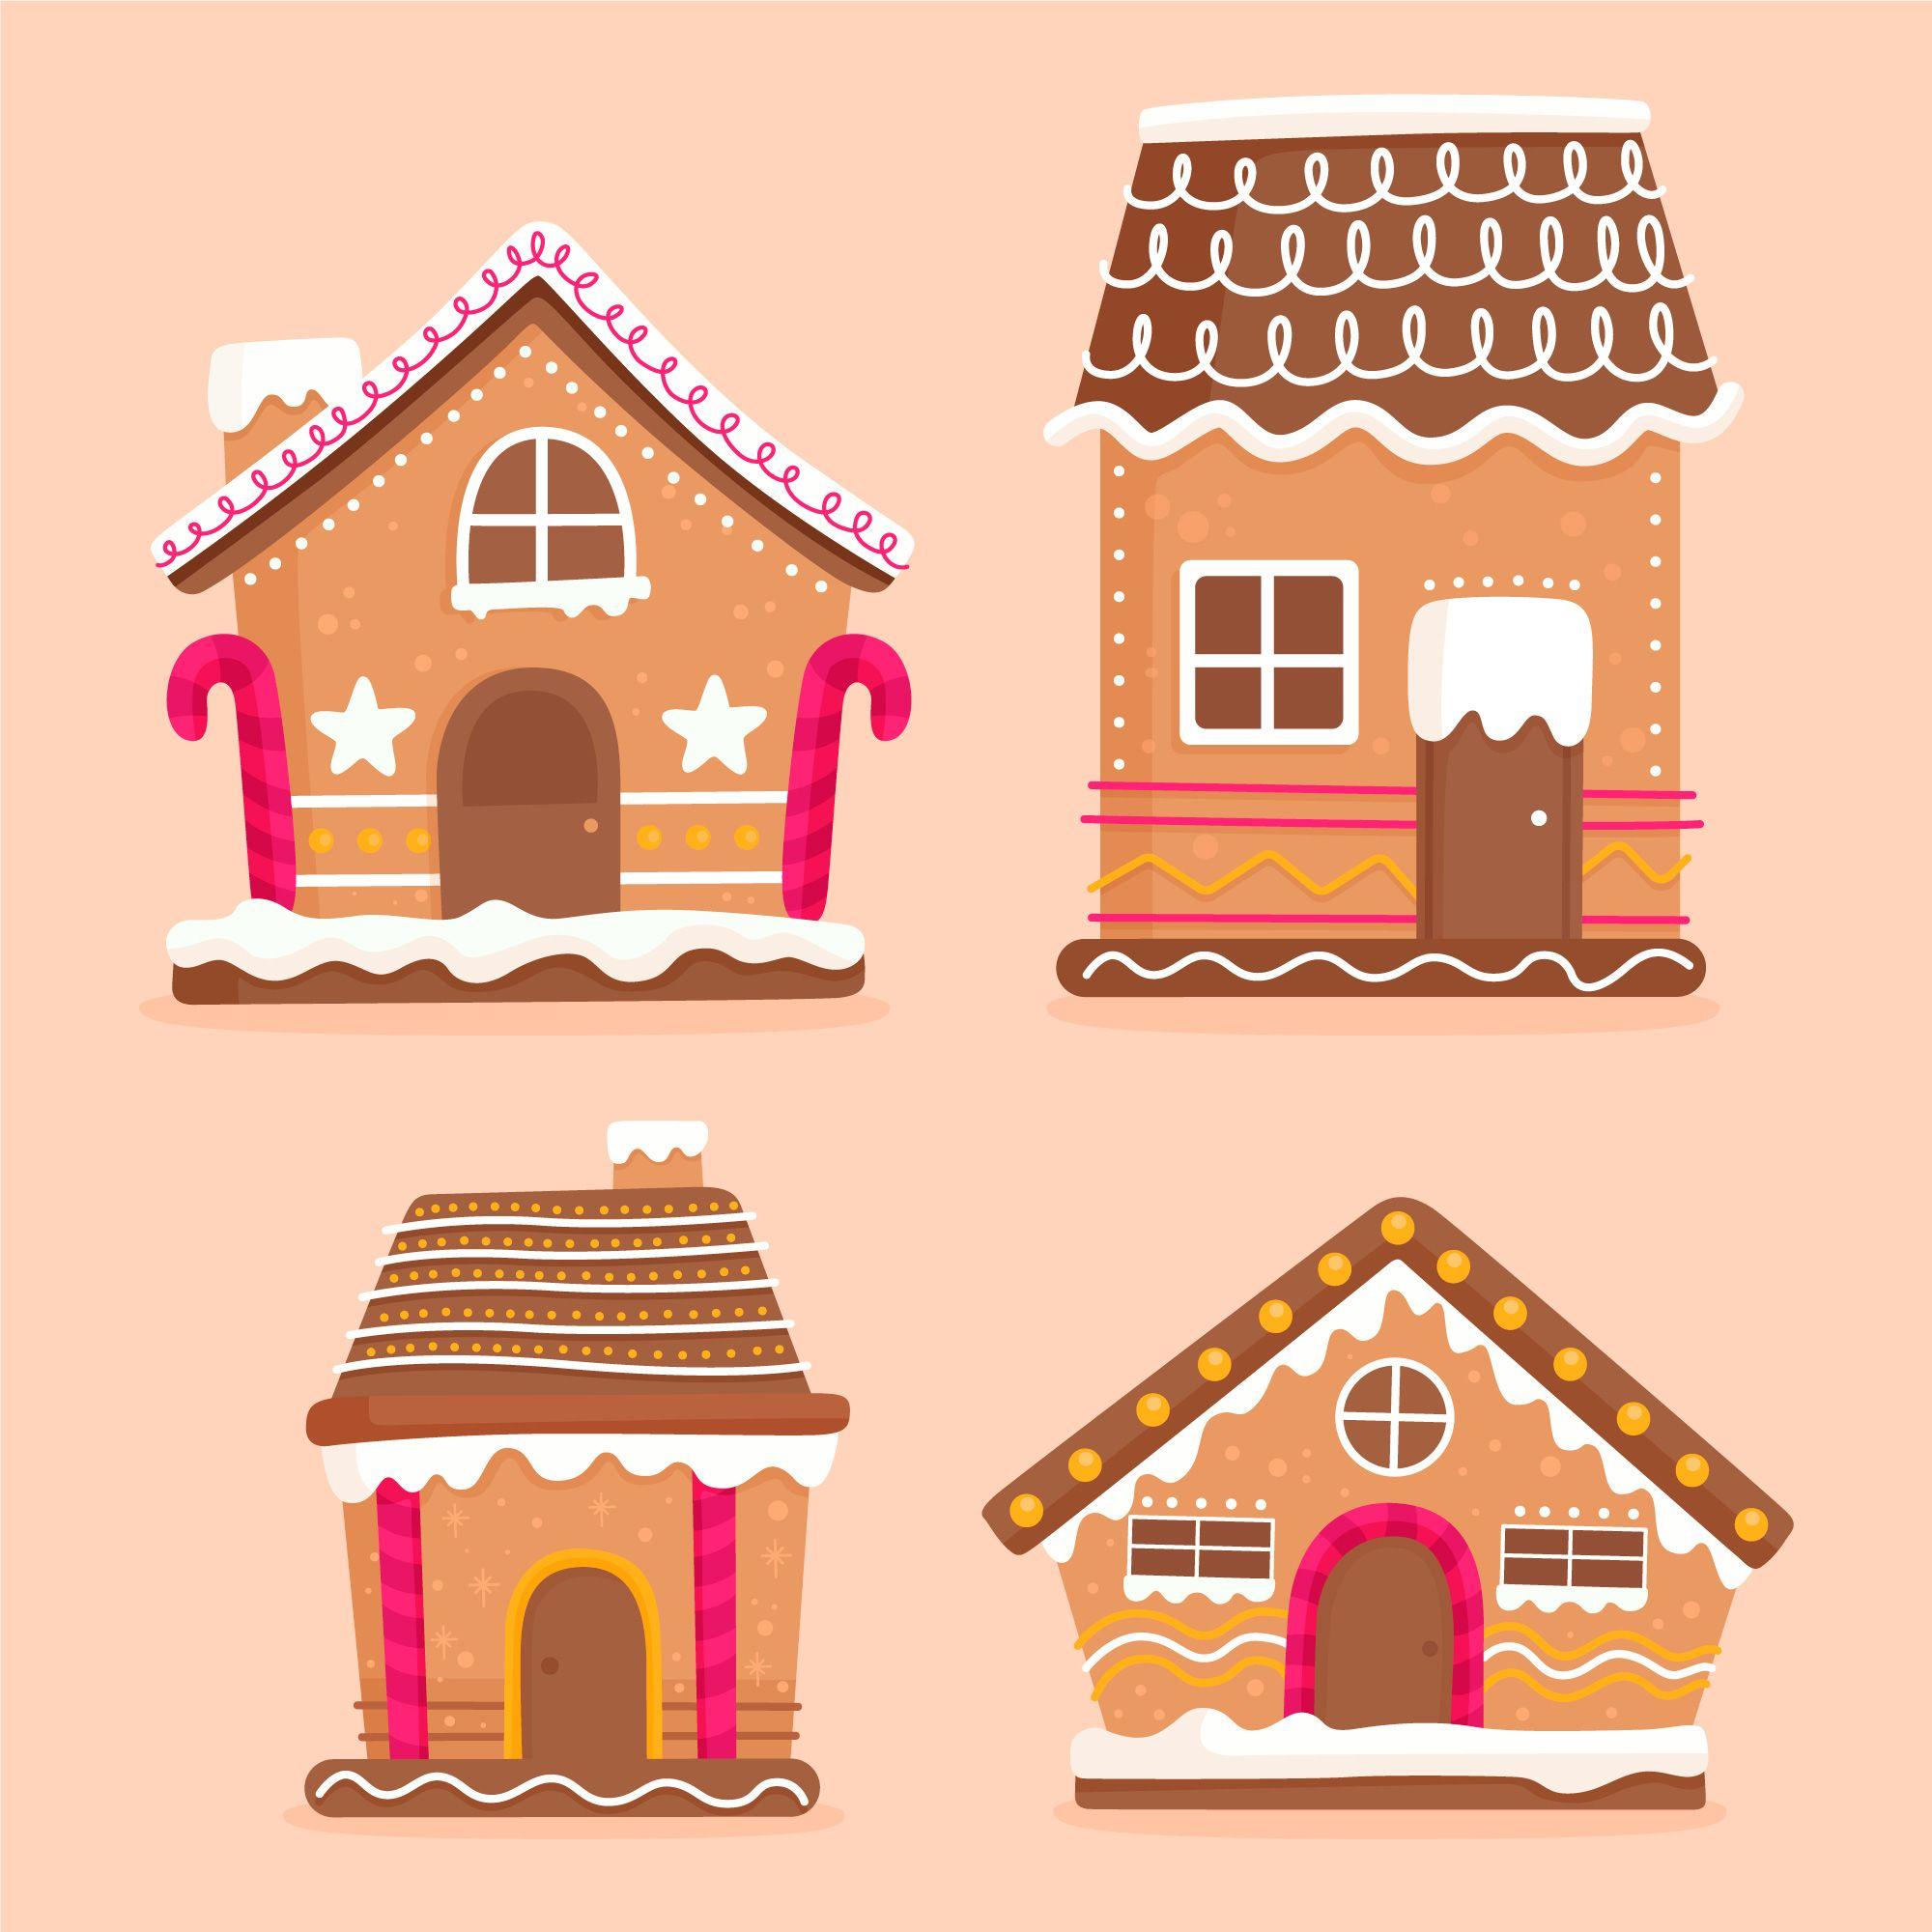 Download Flat Design Gingerbread House Collection For Free In 2020 Gingerbread House Design Vector Free